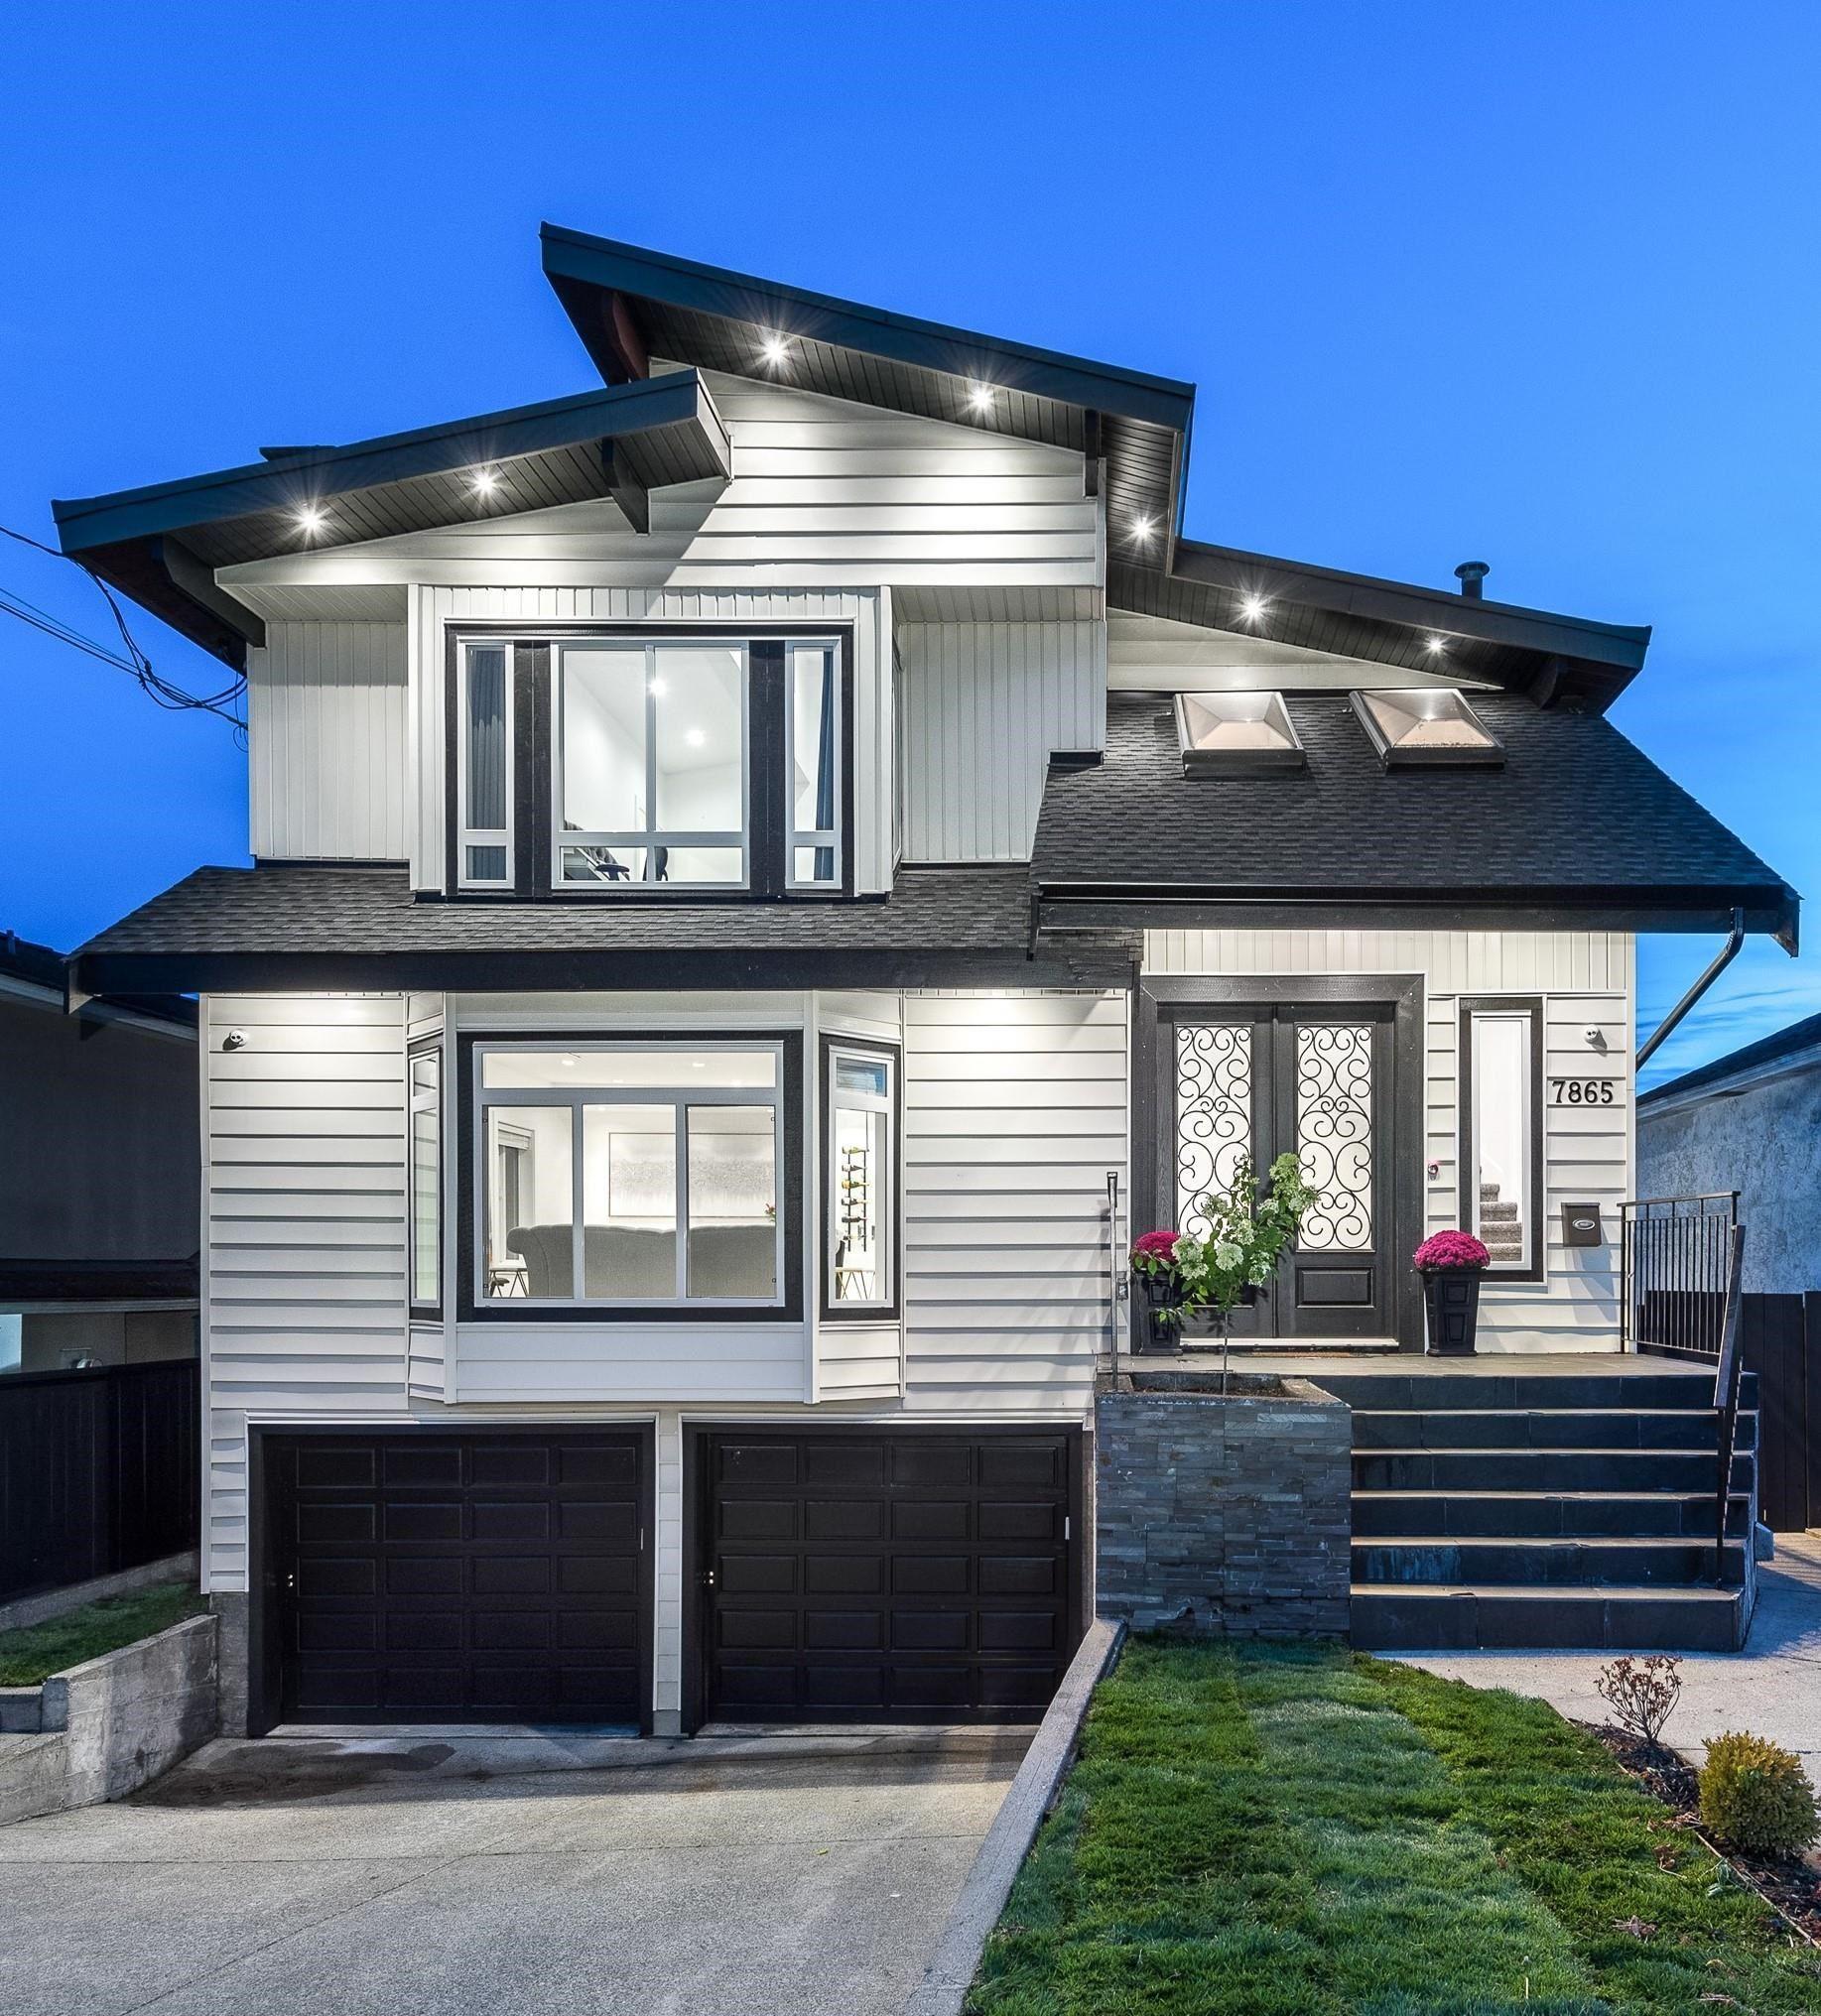 Main Photo: 7865 CUMBERLAND Street in Burnaby: East Burnaby House for sale (Burnaby East)  : MLS®# R2608957